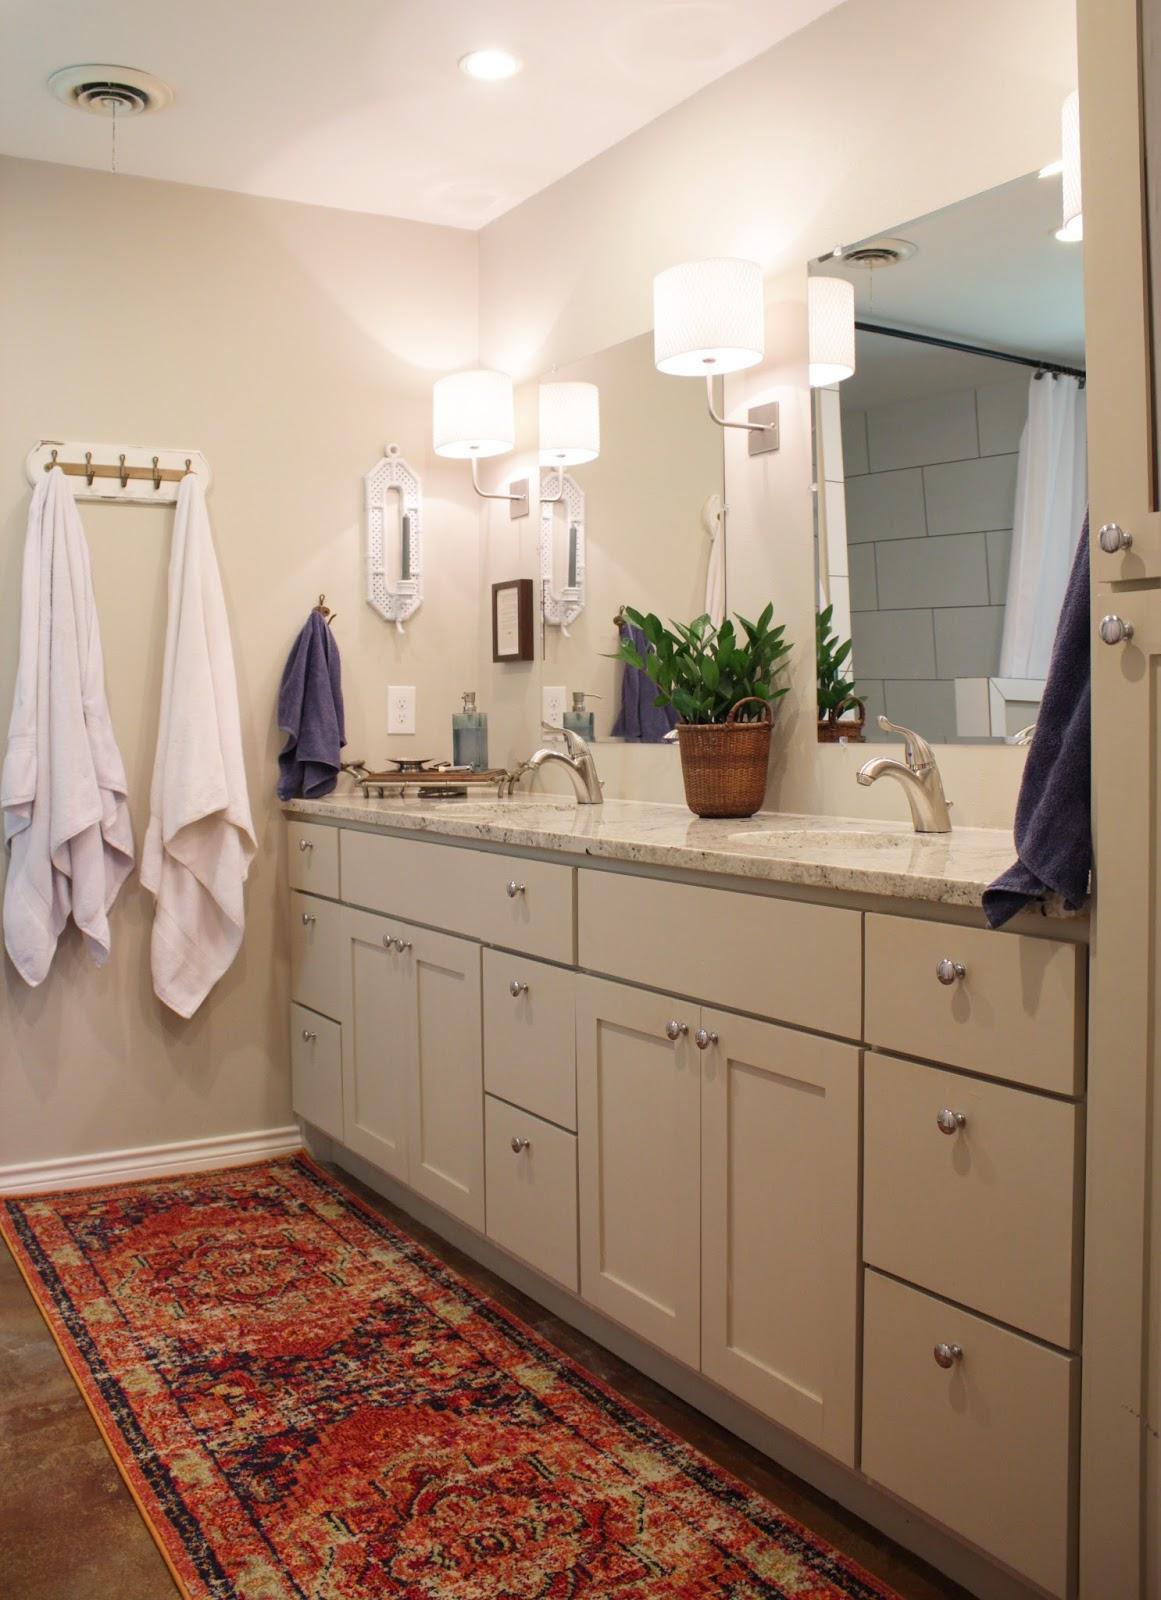 House Homemade Adding Color To Our Neutral Bathroom - Adding a master bathroom